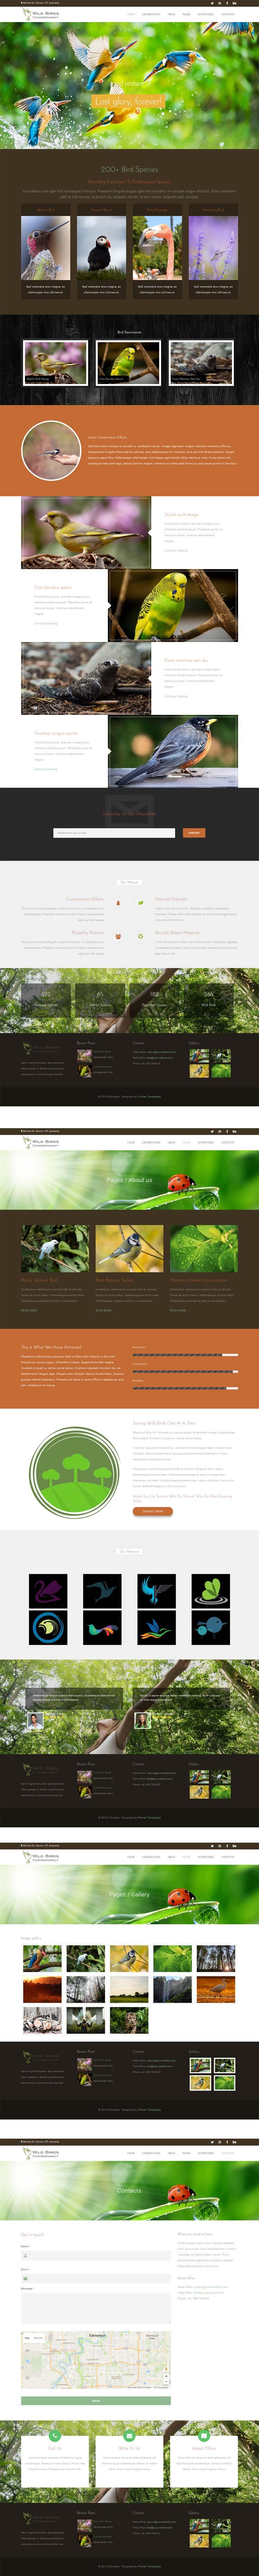 Bird Sanctuary Joomla! template